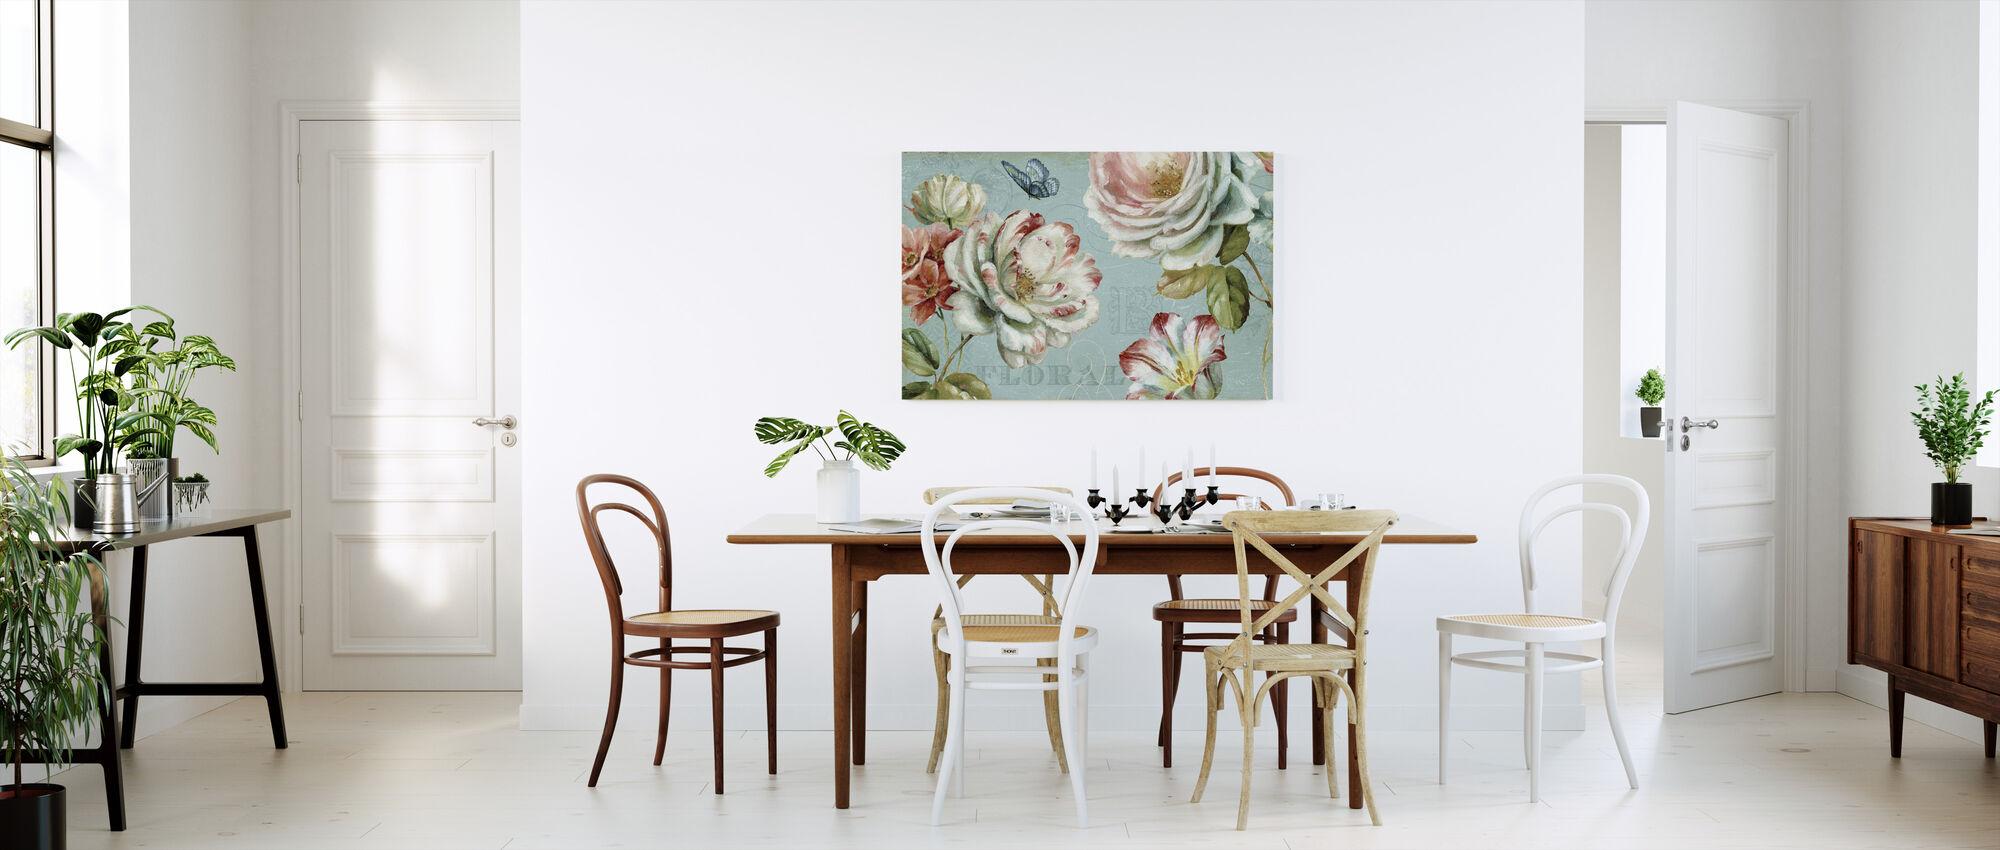 Lente Romance - Canvas print - Keuken